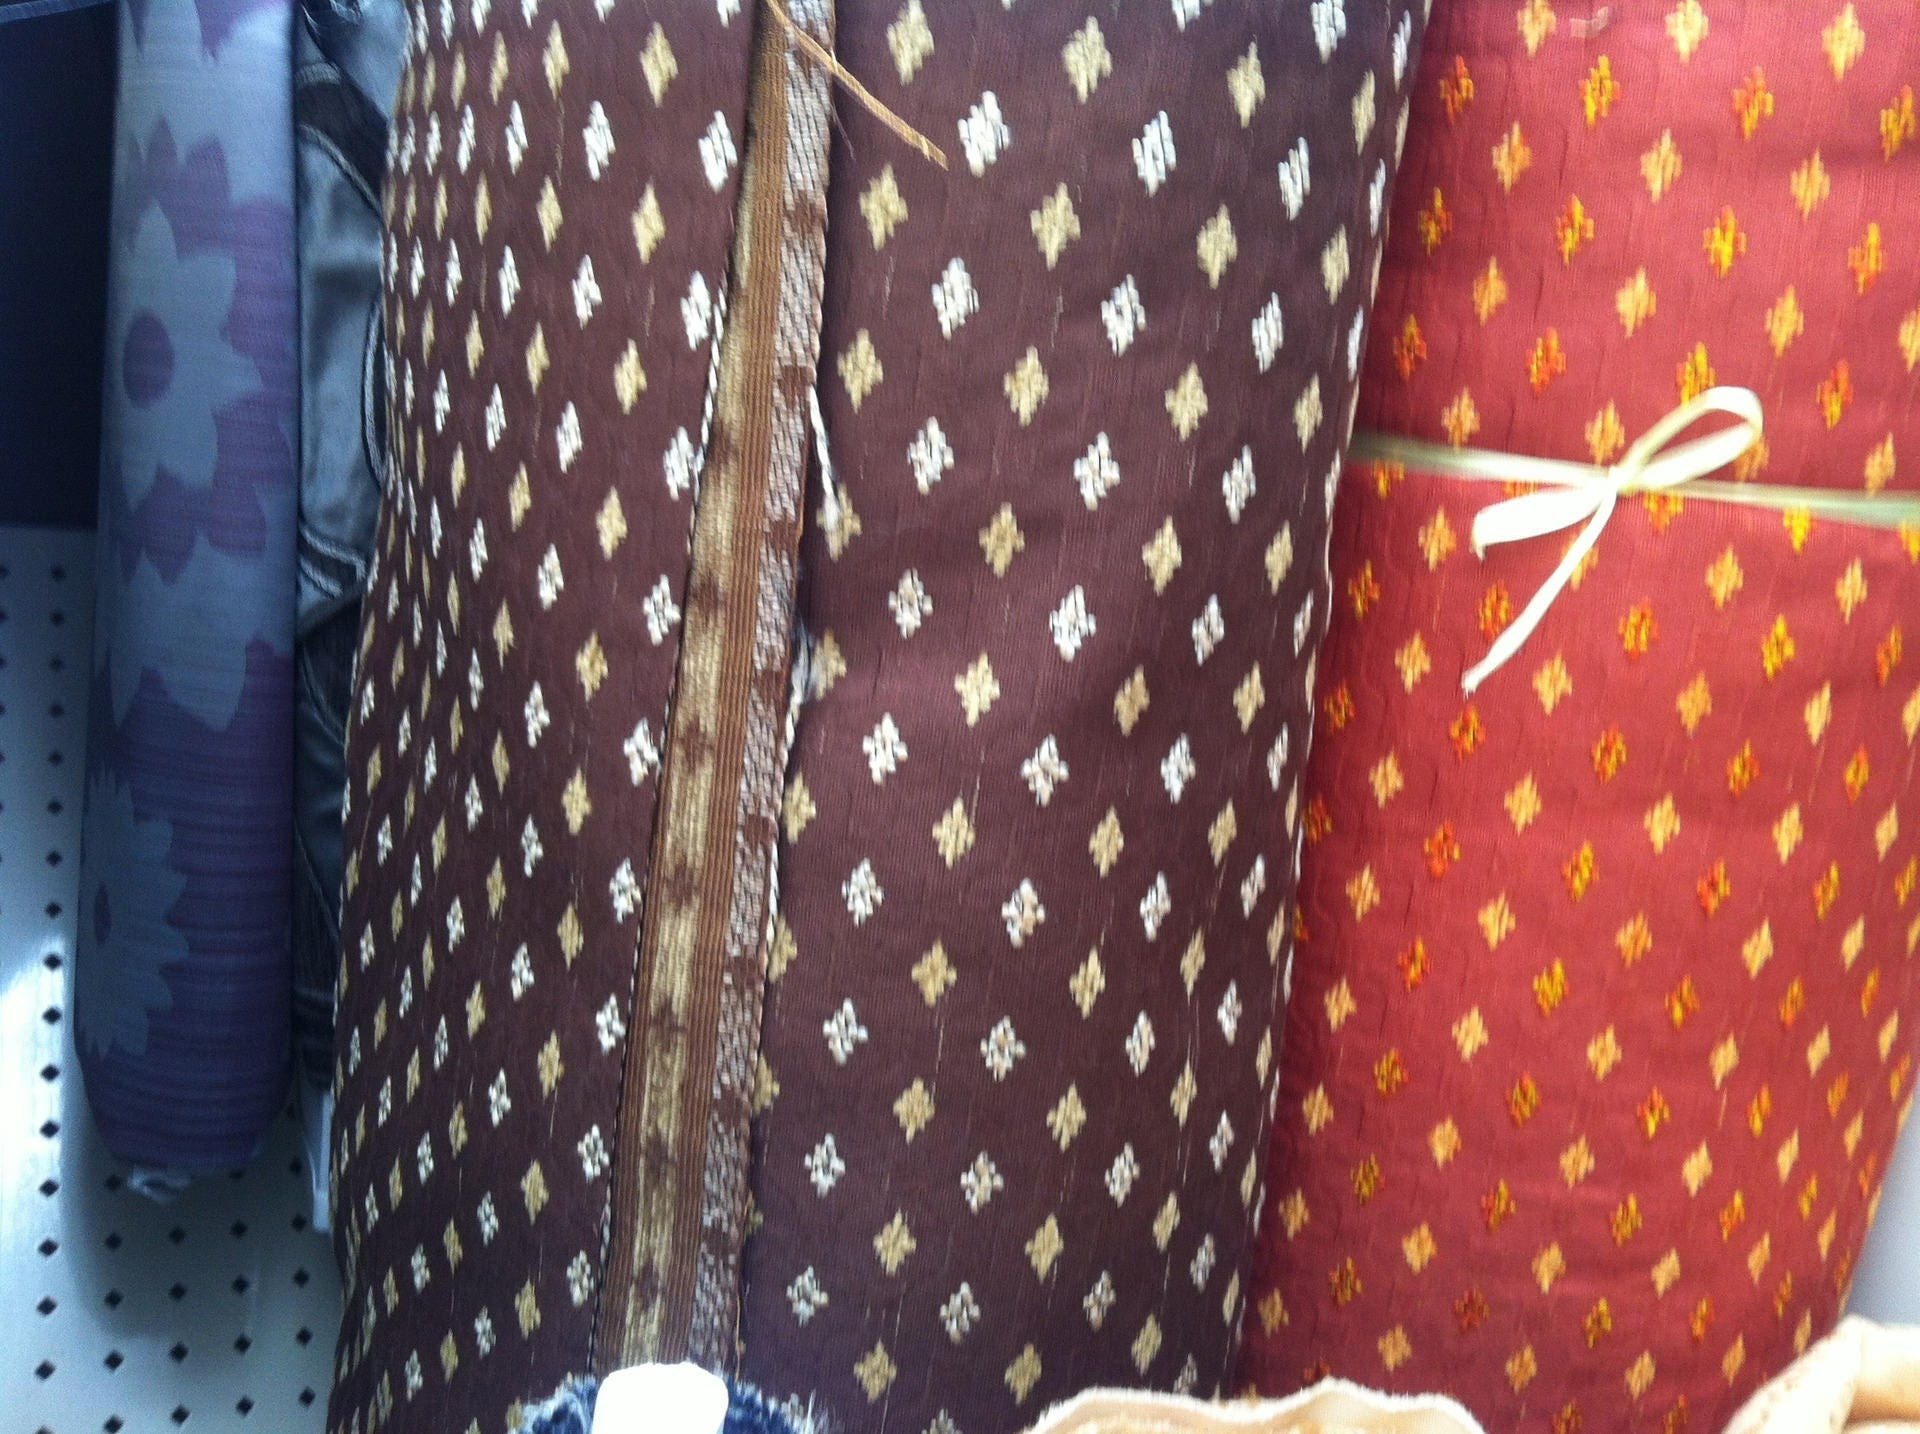 tissus double rideau possible combine. Black Bedroom Furniture Sets. Home Design Ideas